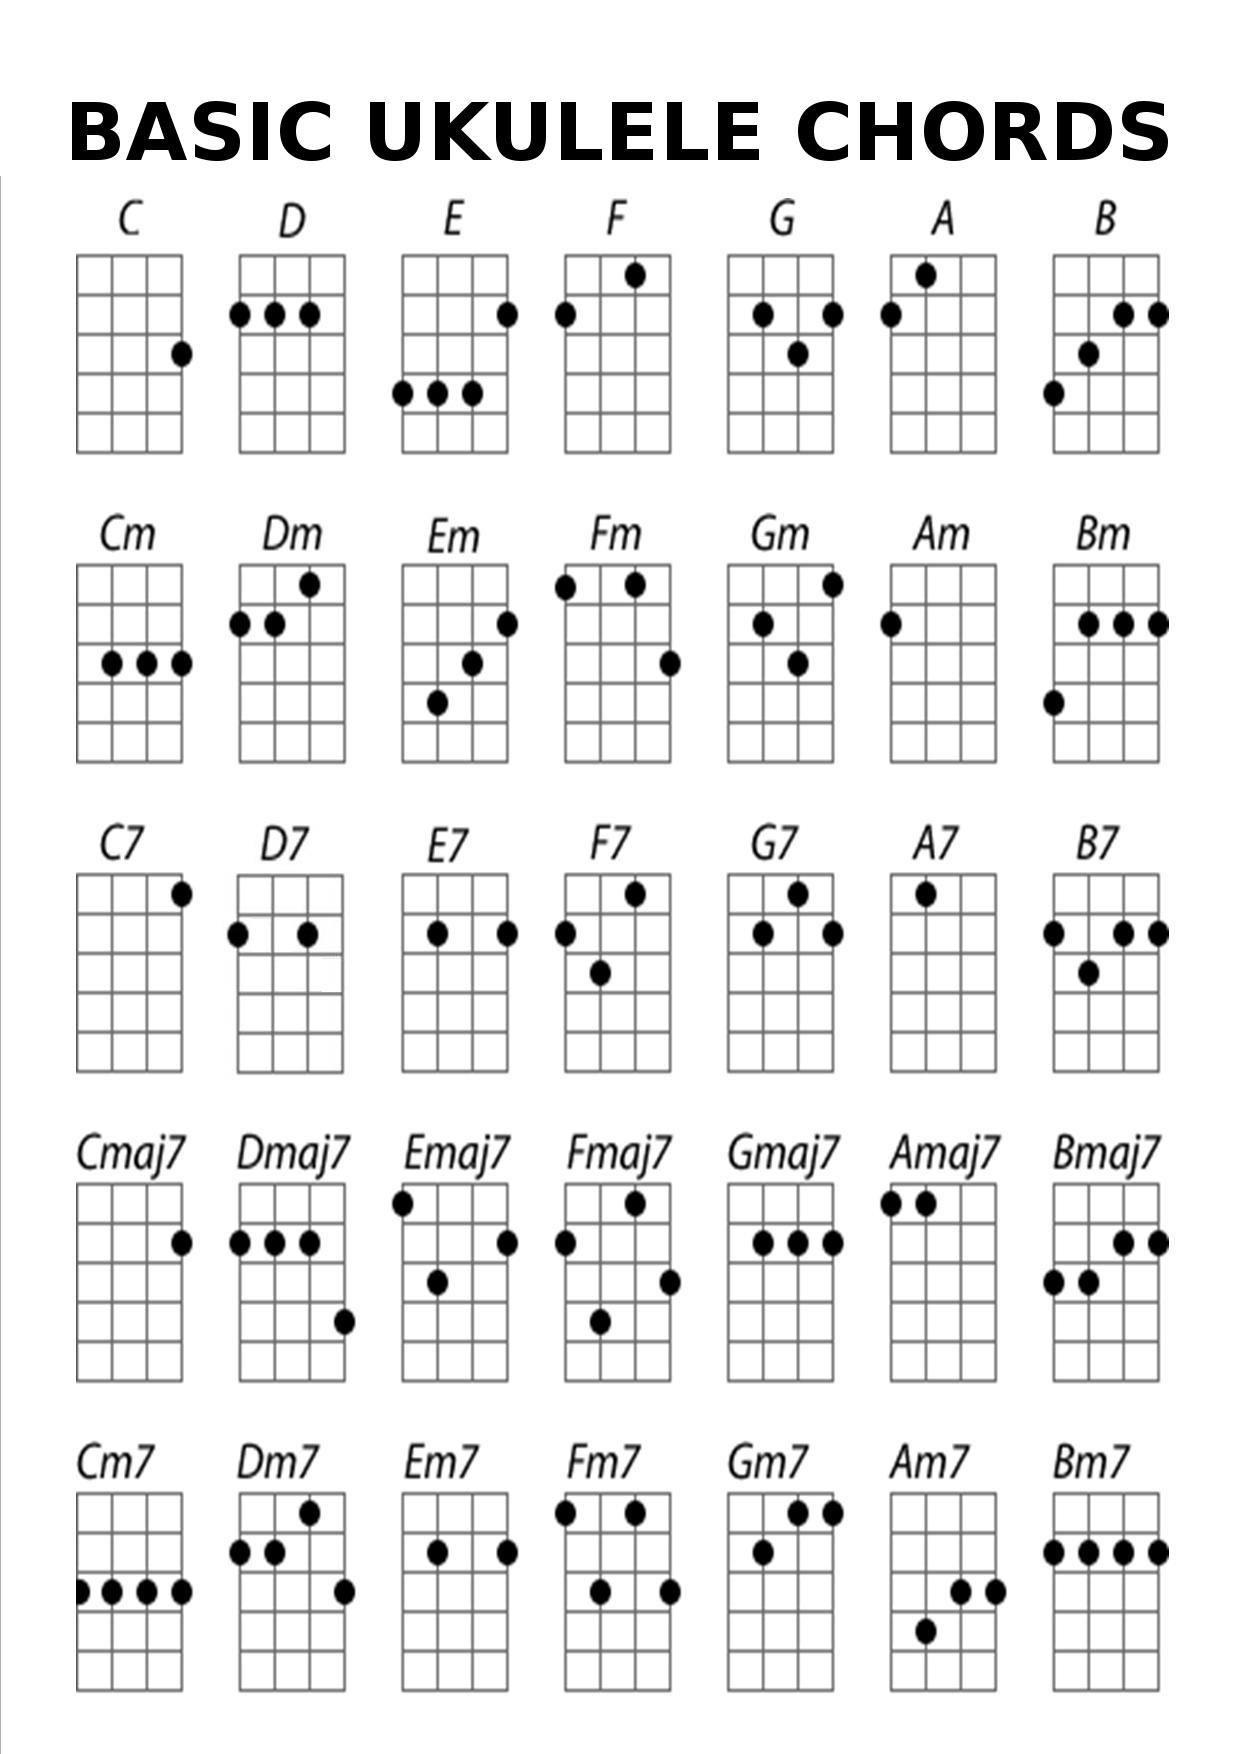 Ukelele Chords - Free Guitar Lessons